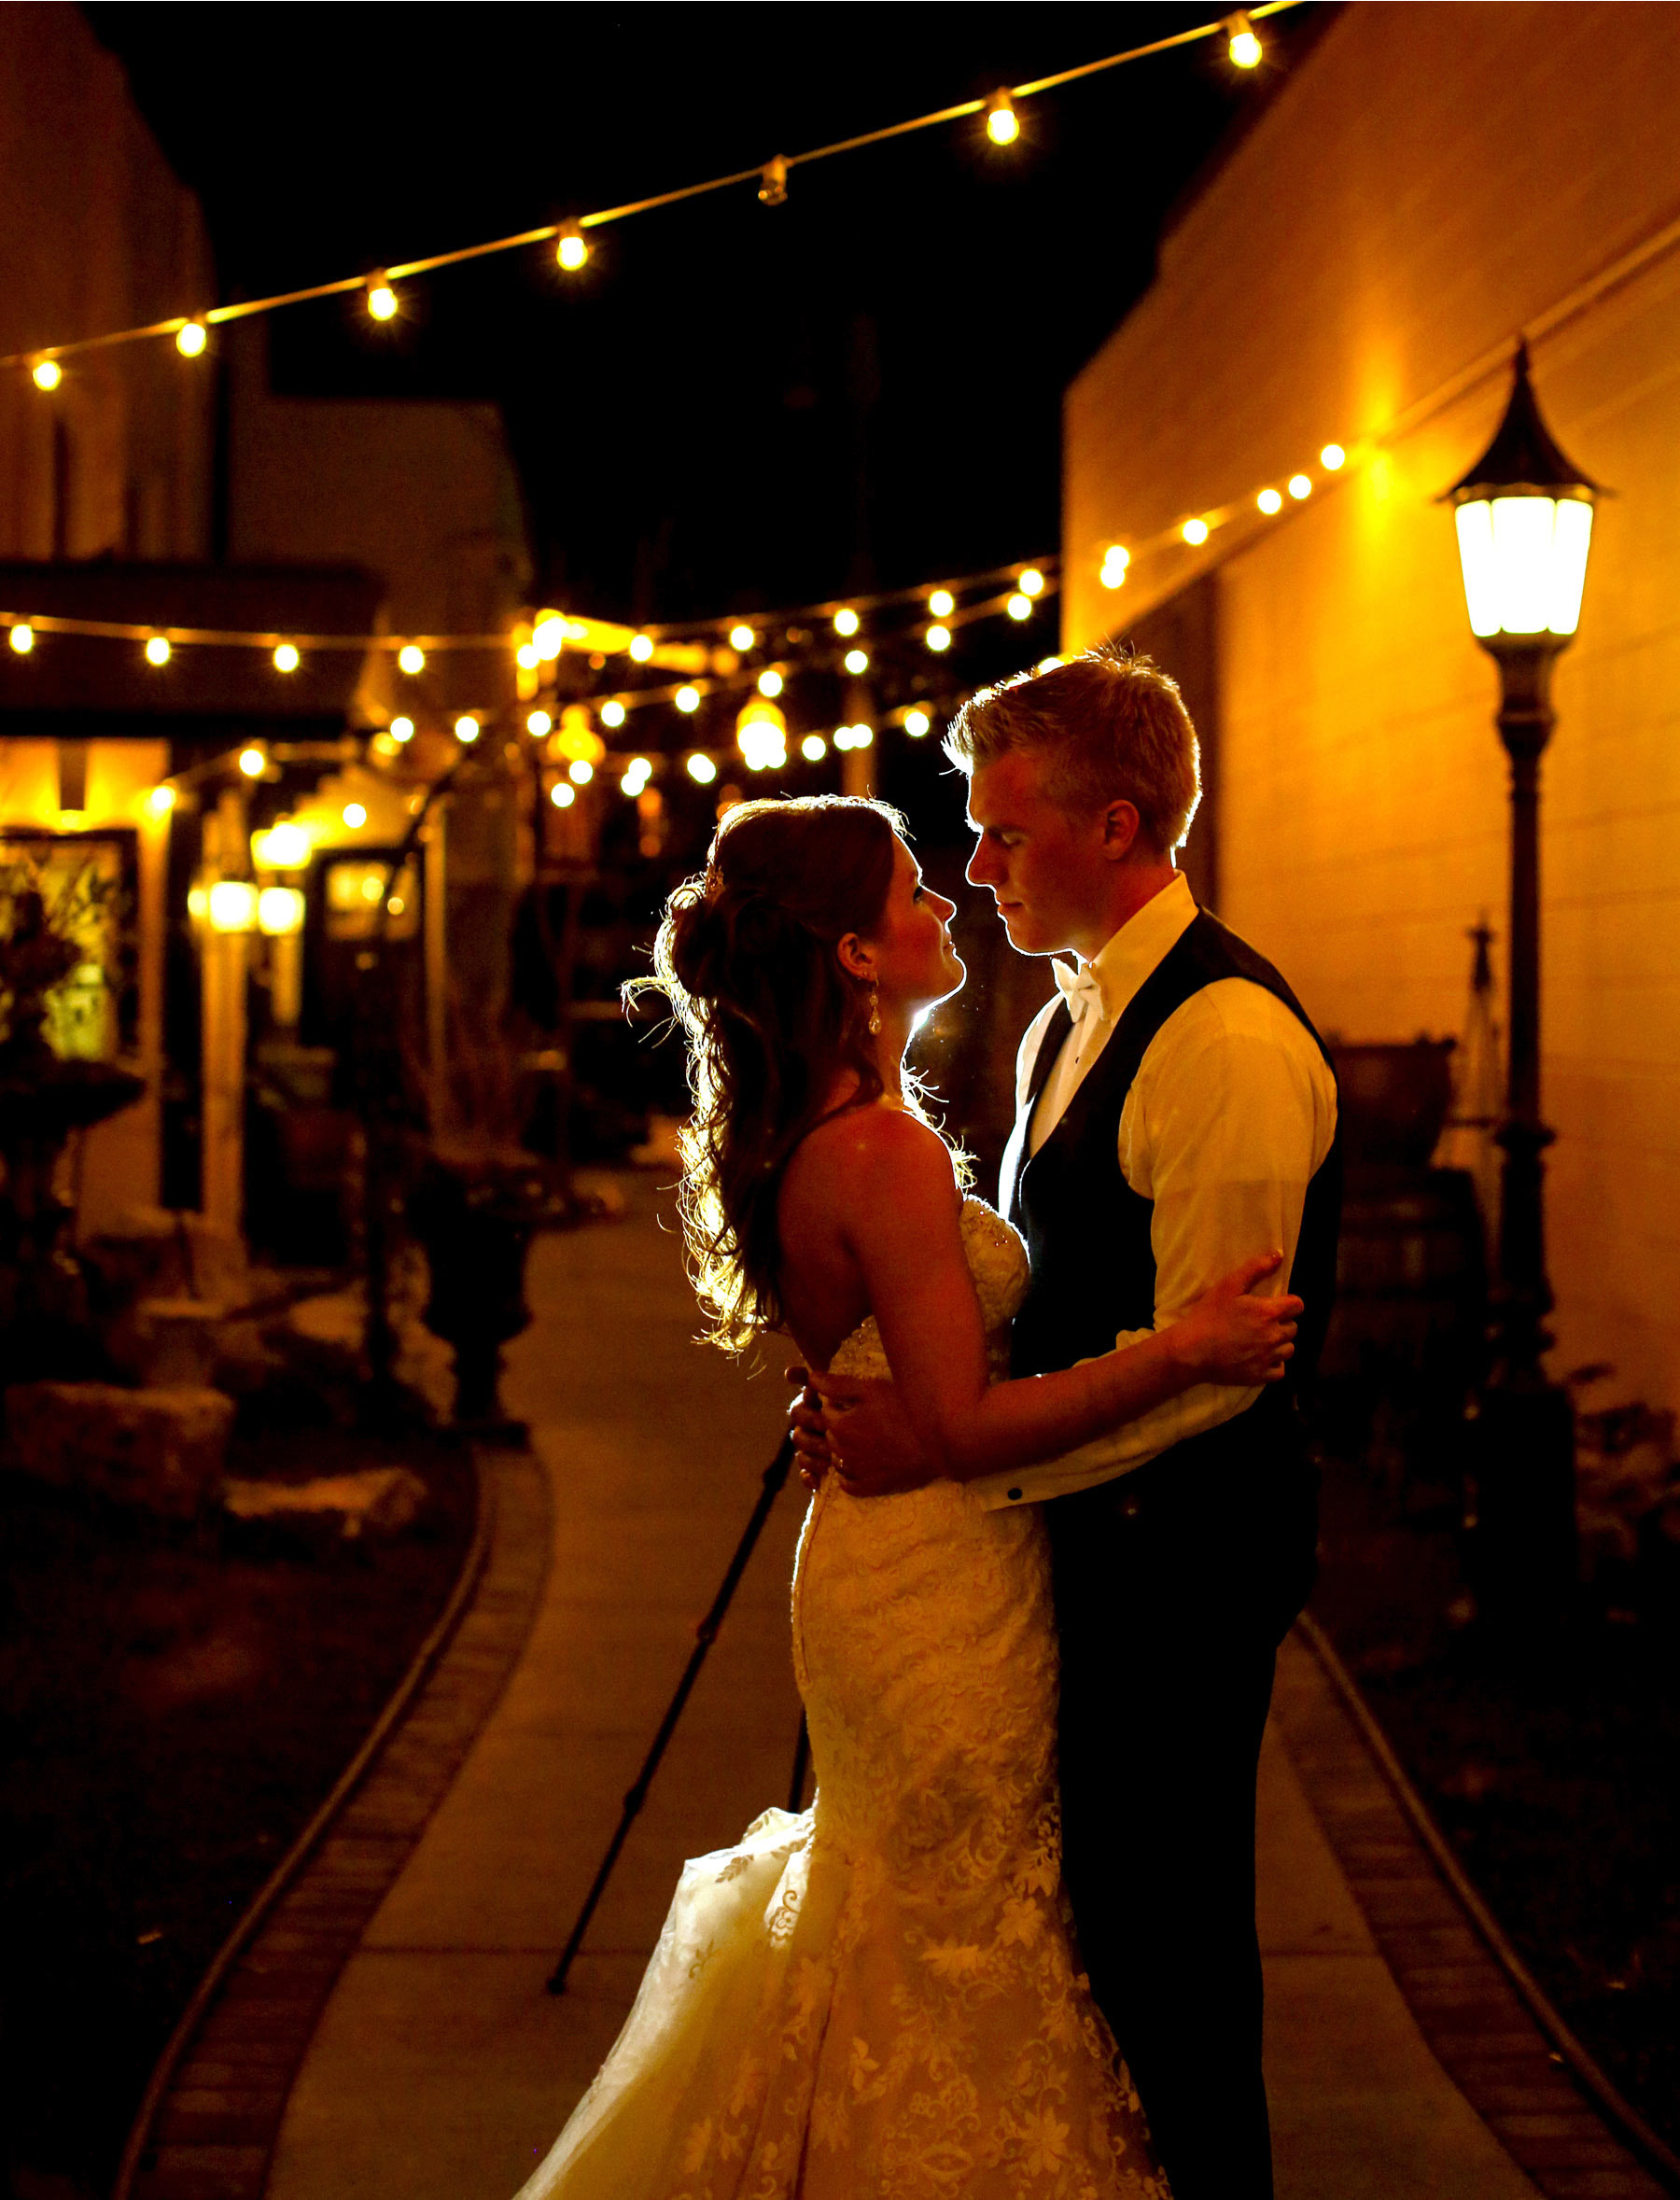 16-Minneapolis-Minnesota-Wedding-Photography-by-Vick-Photography-Reception-Kellermans-Event-Center-Tianna-&-Matt.jpg